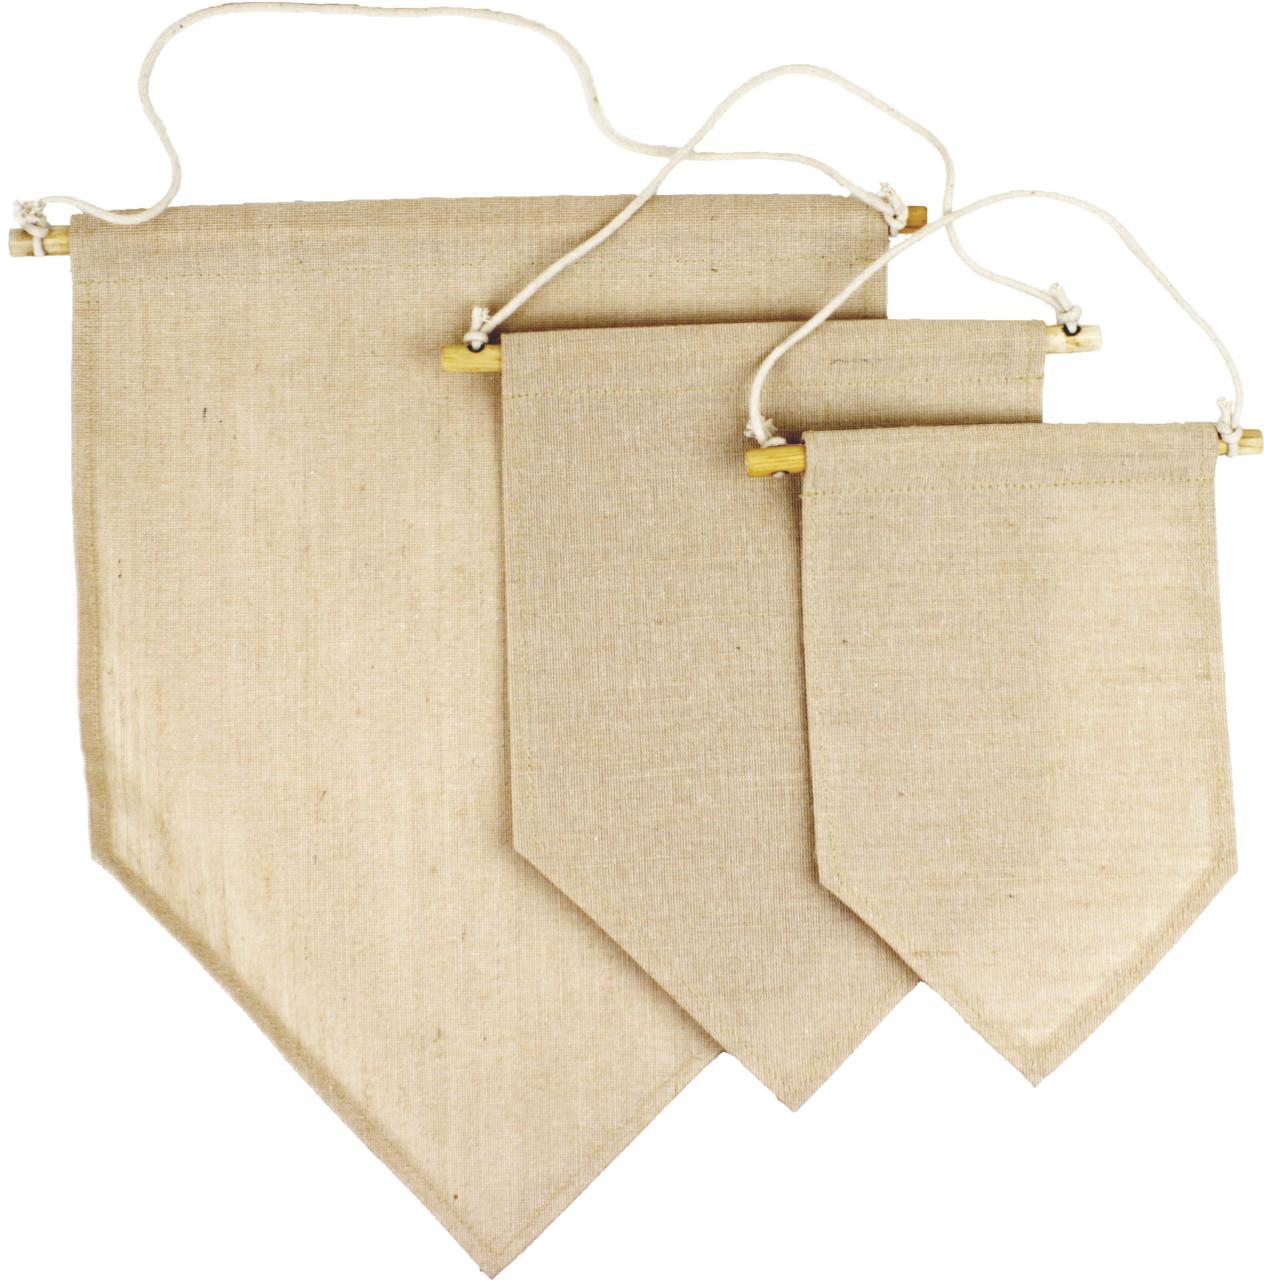 Jute Blend Hanging Wall Pennant Banner, T165-71, T164-71, T163-71 | Packaging Decor